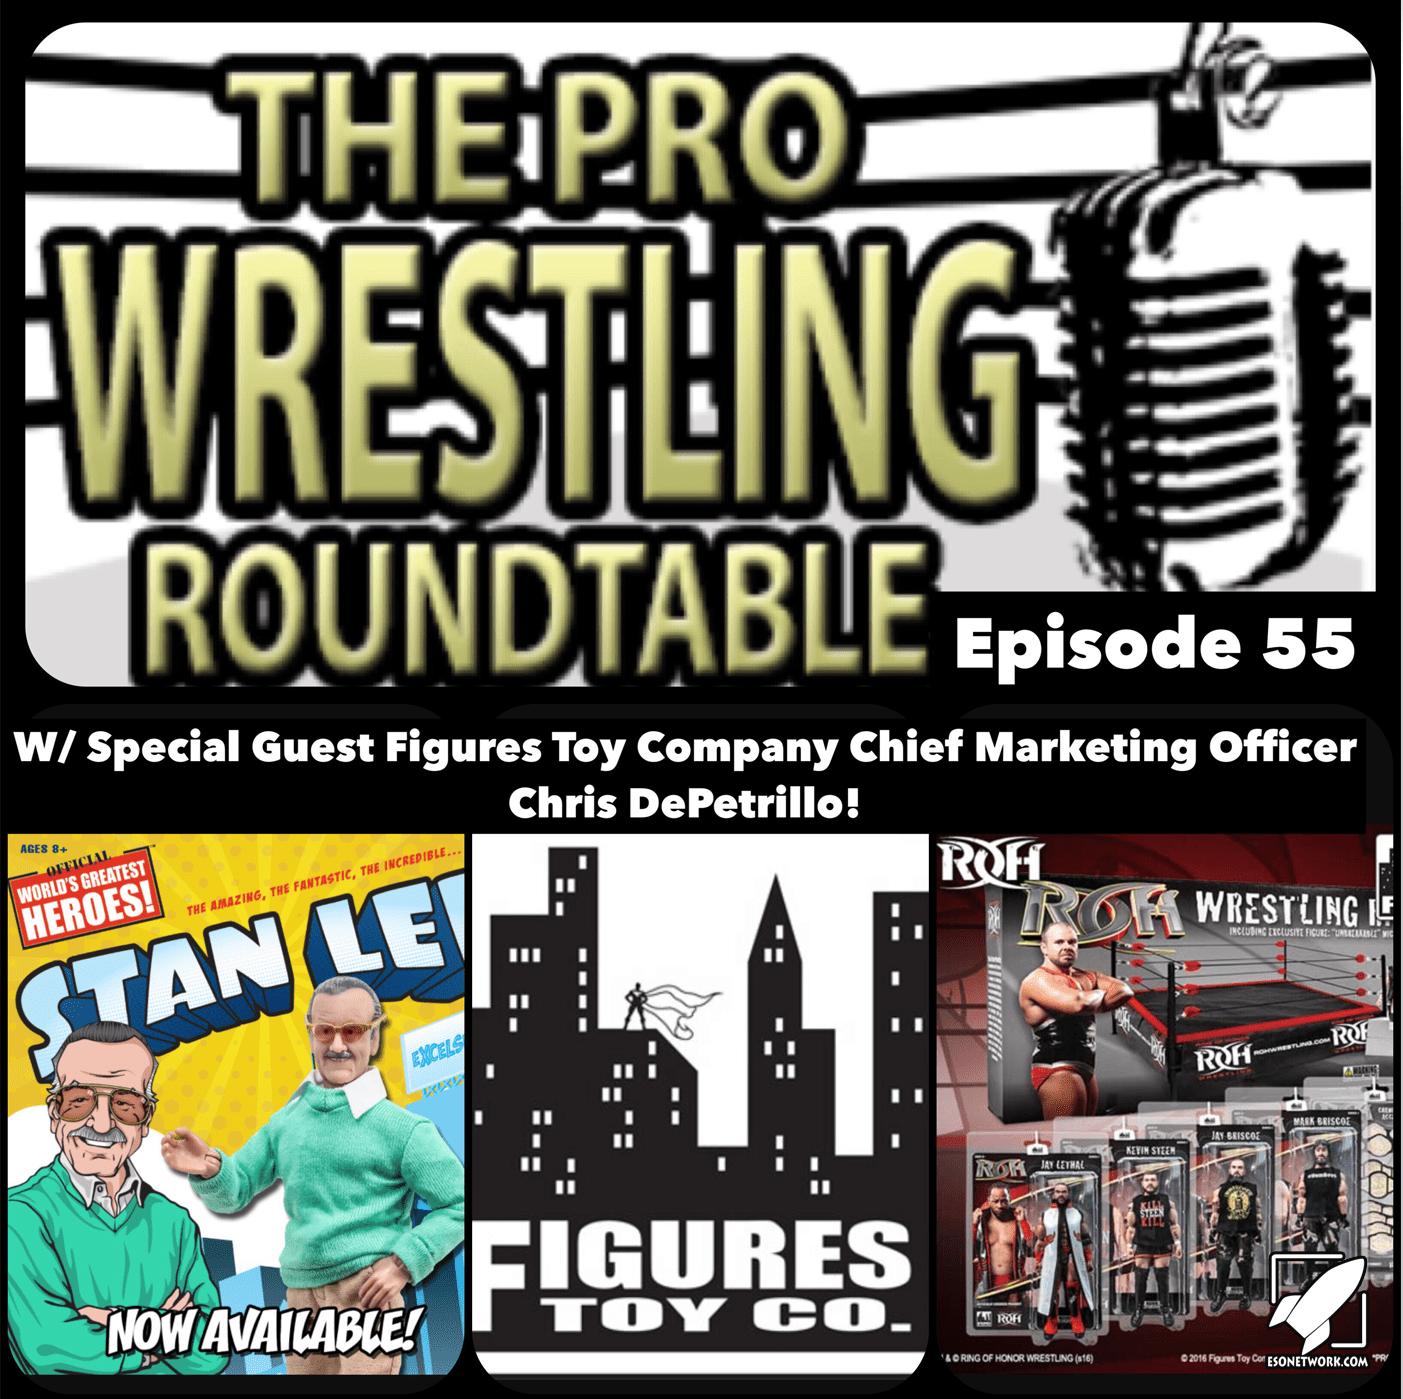 Pro Wrestling Roundtable Ep 55